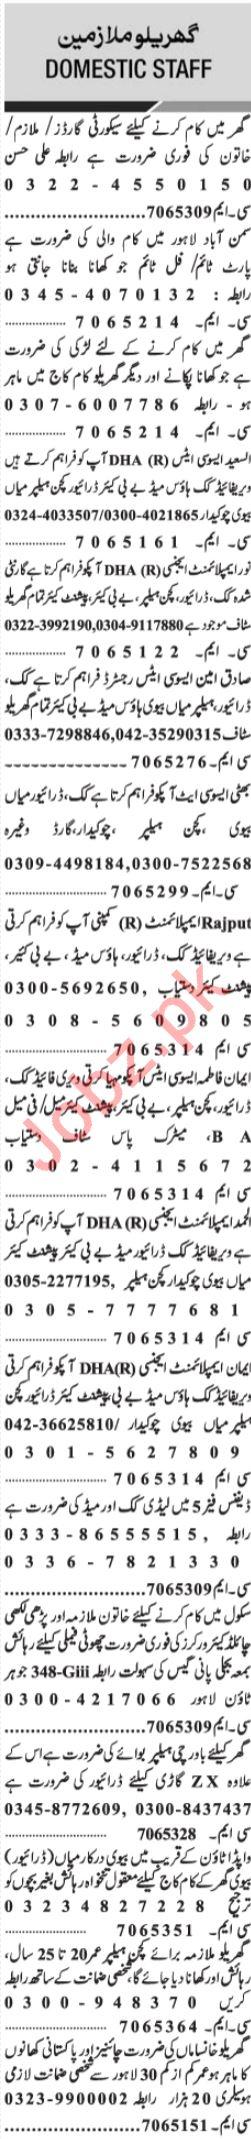 Jang Sunday Classified Ads 28th April 2019 Domestic Staff